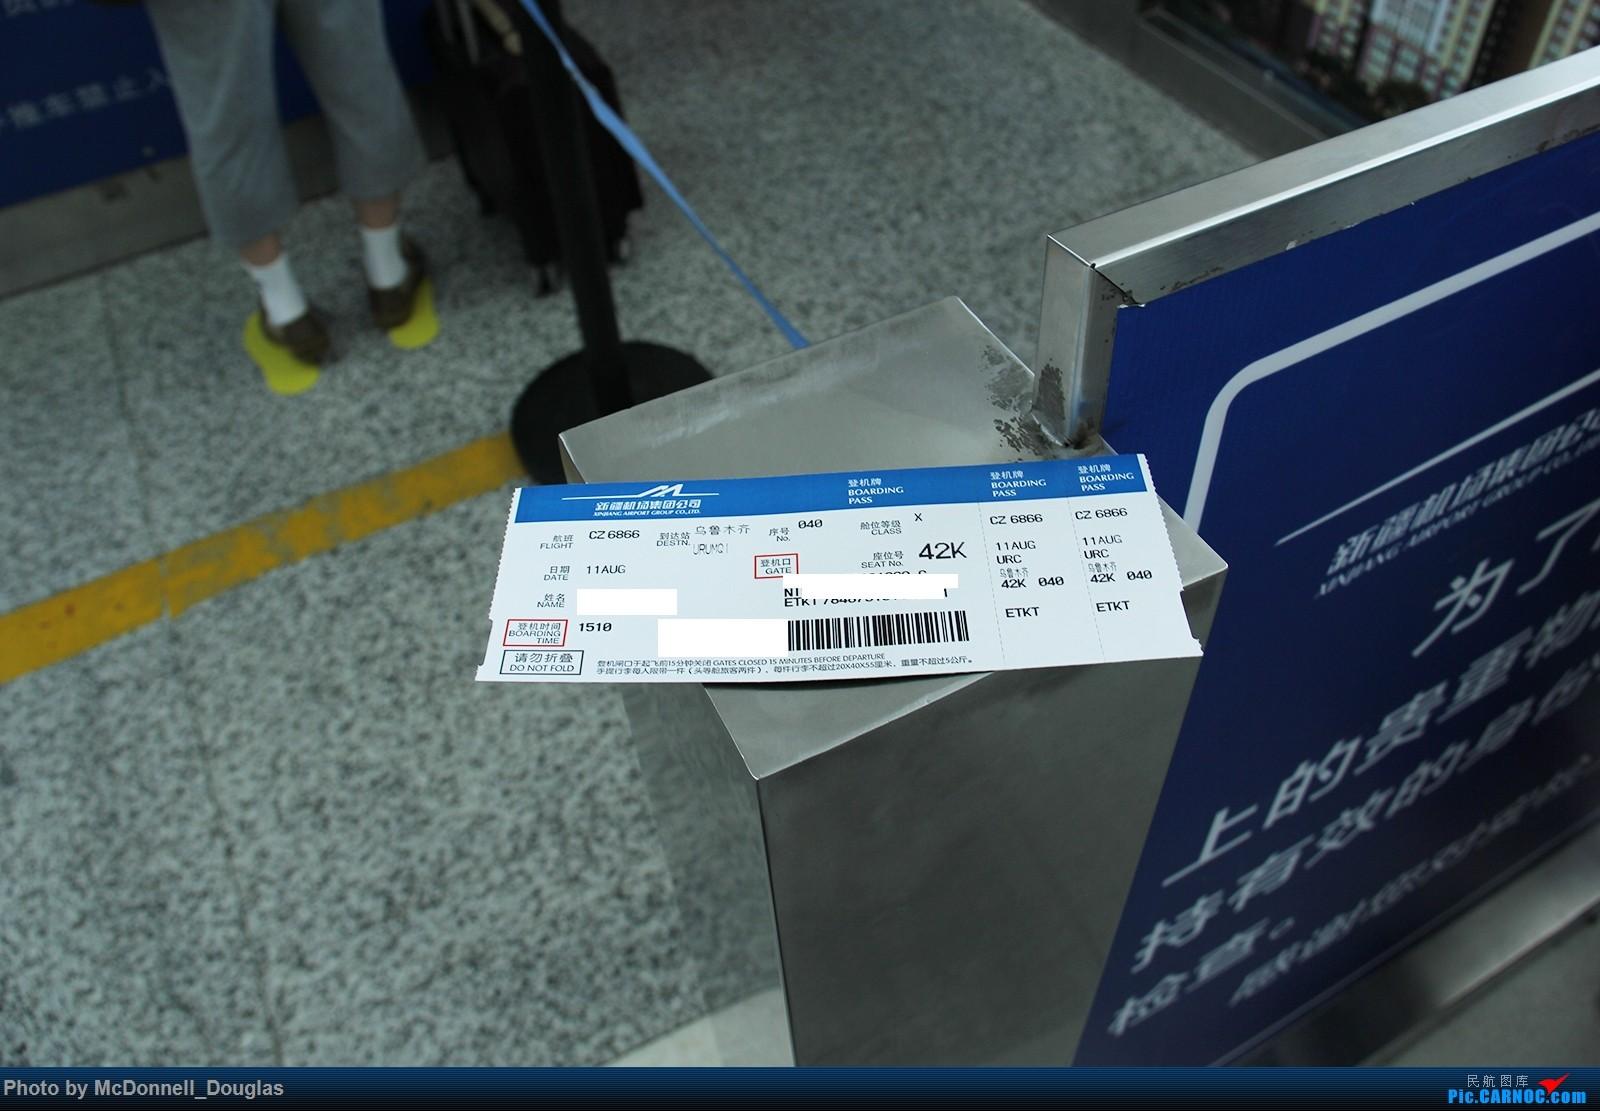 Re:[原创]【上海飞友会】【zc带你走天下(3)】再访祖辈年轻时工作的土地,父母年少时生活戈壁,跨越大半个中国去看新疆,回程小游蓉城(下)   中国上海赛车场机场